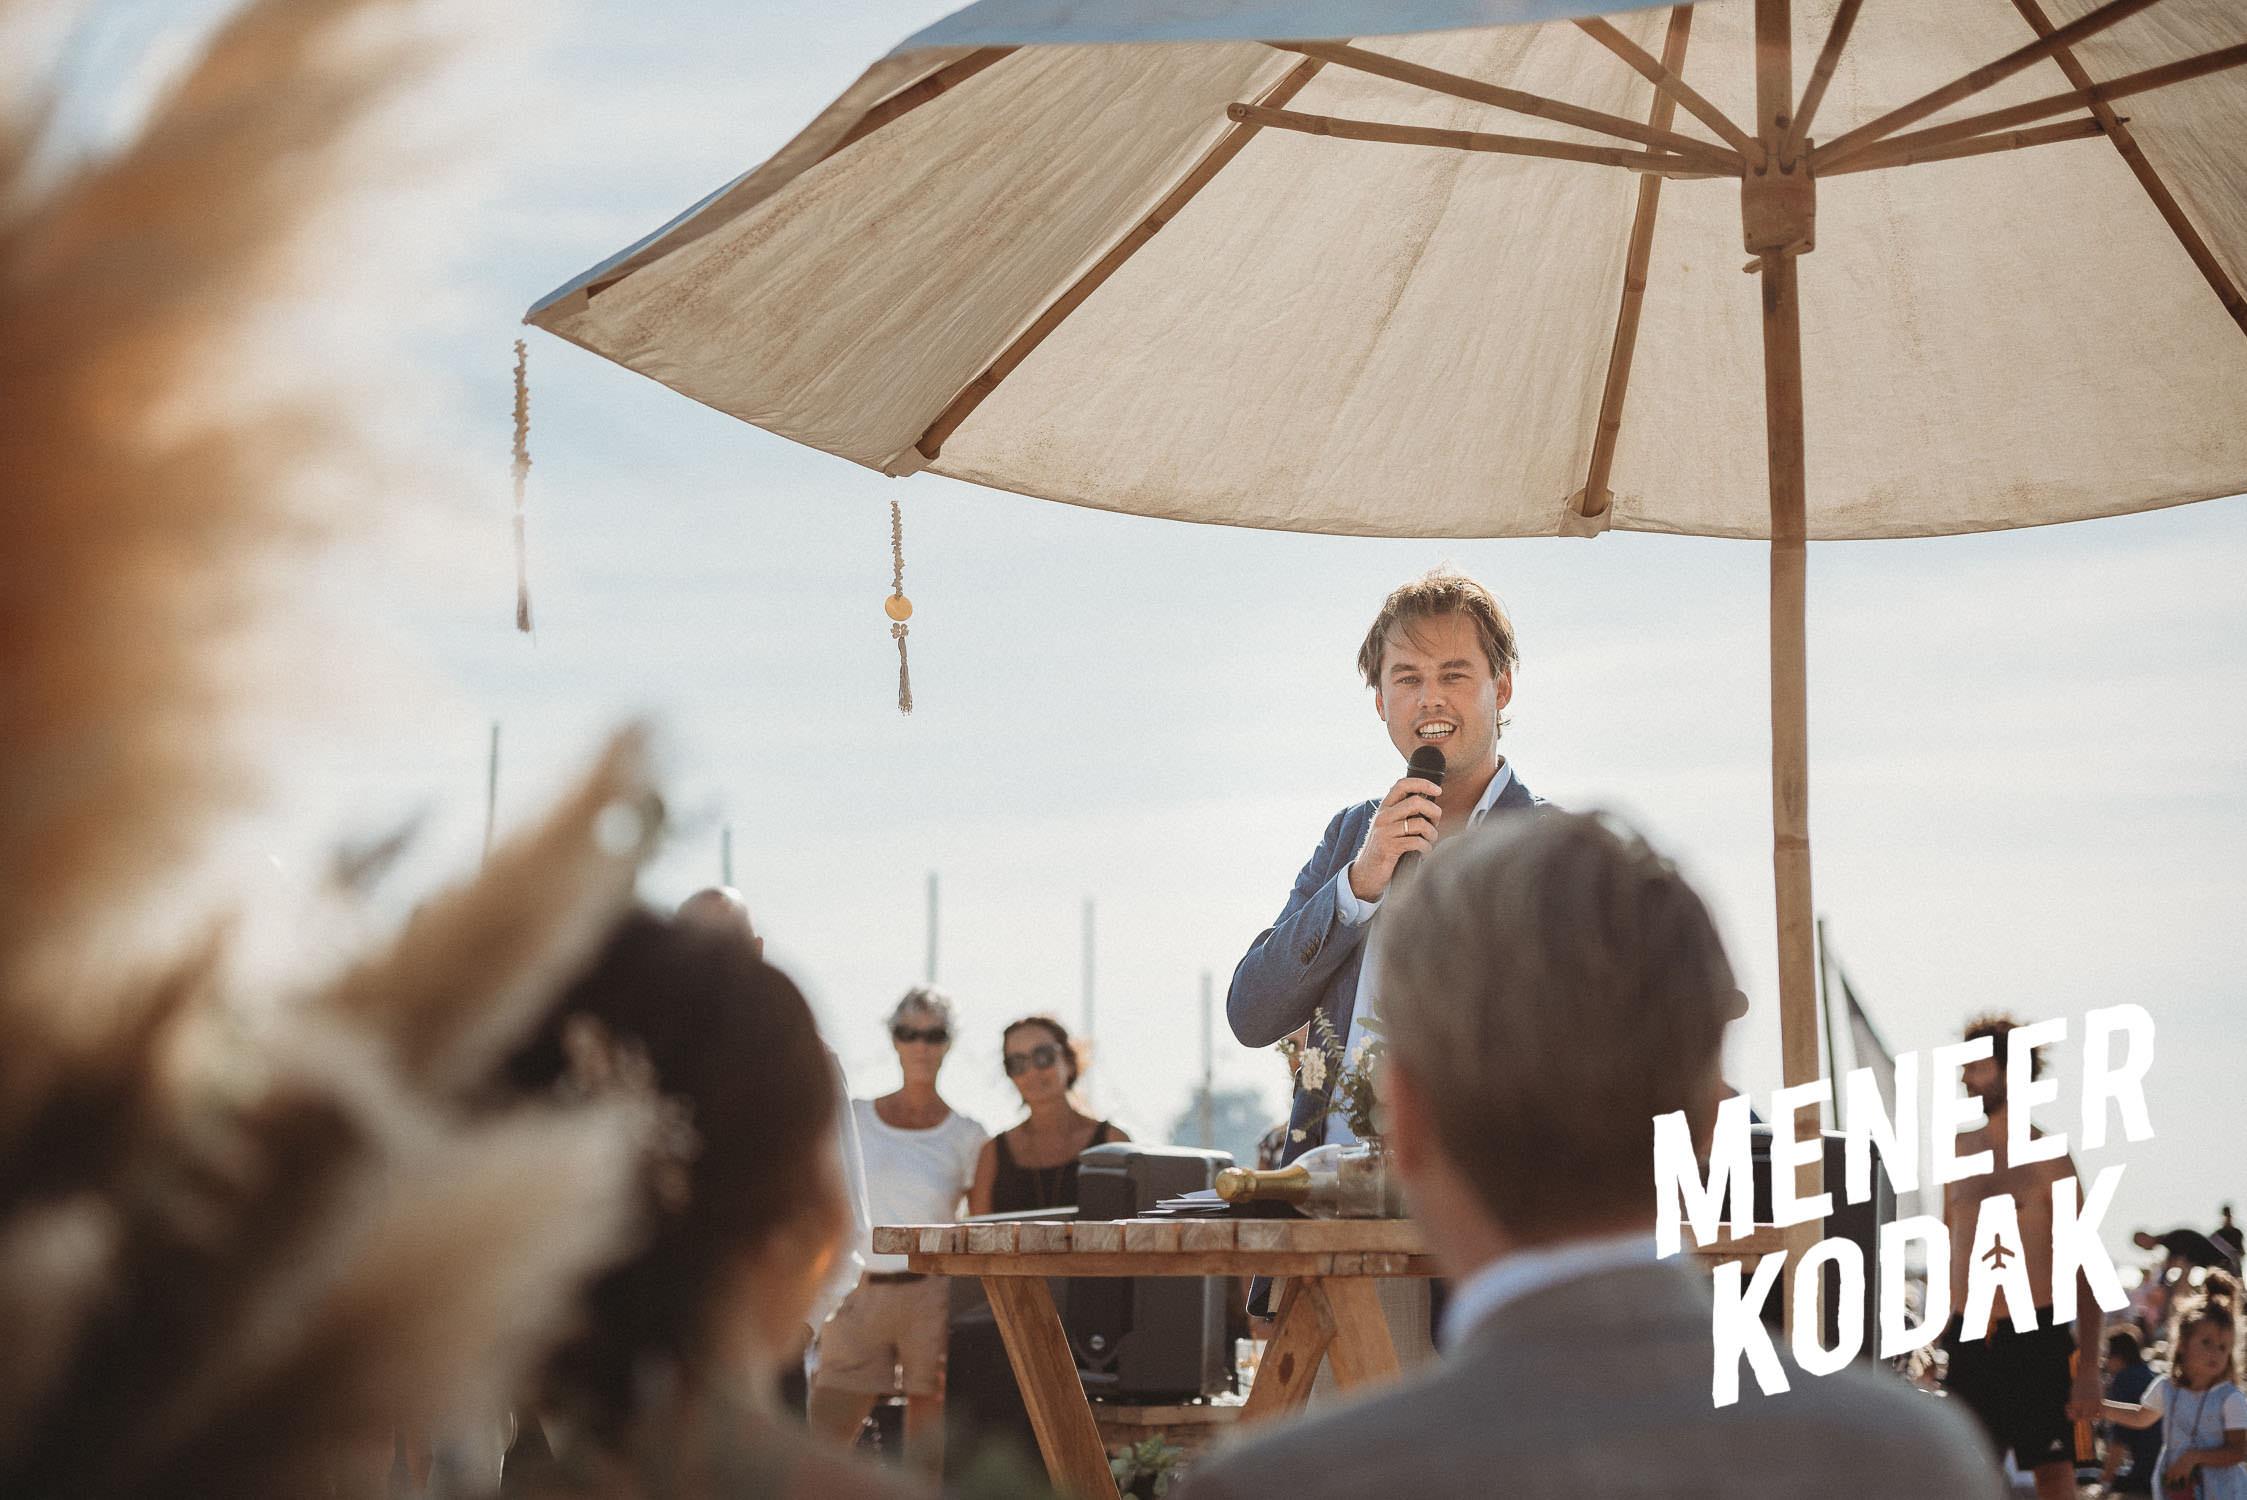 Meneer Kodak - Strandbruiloft - Noordwijk - K&A-085.jpg